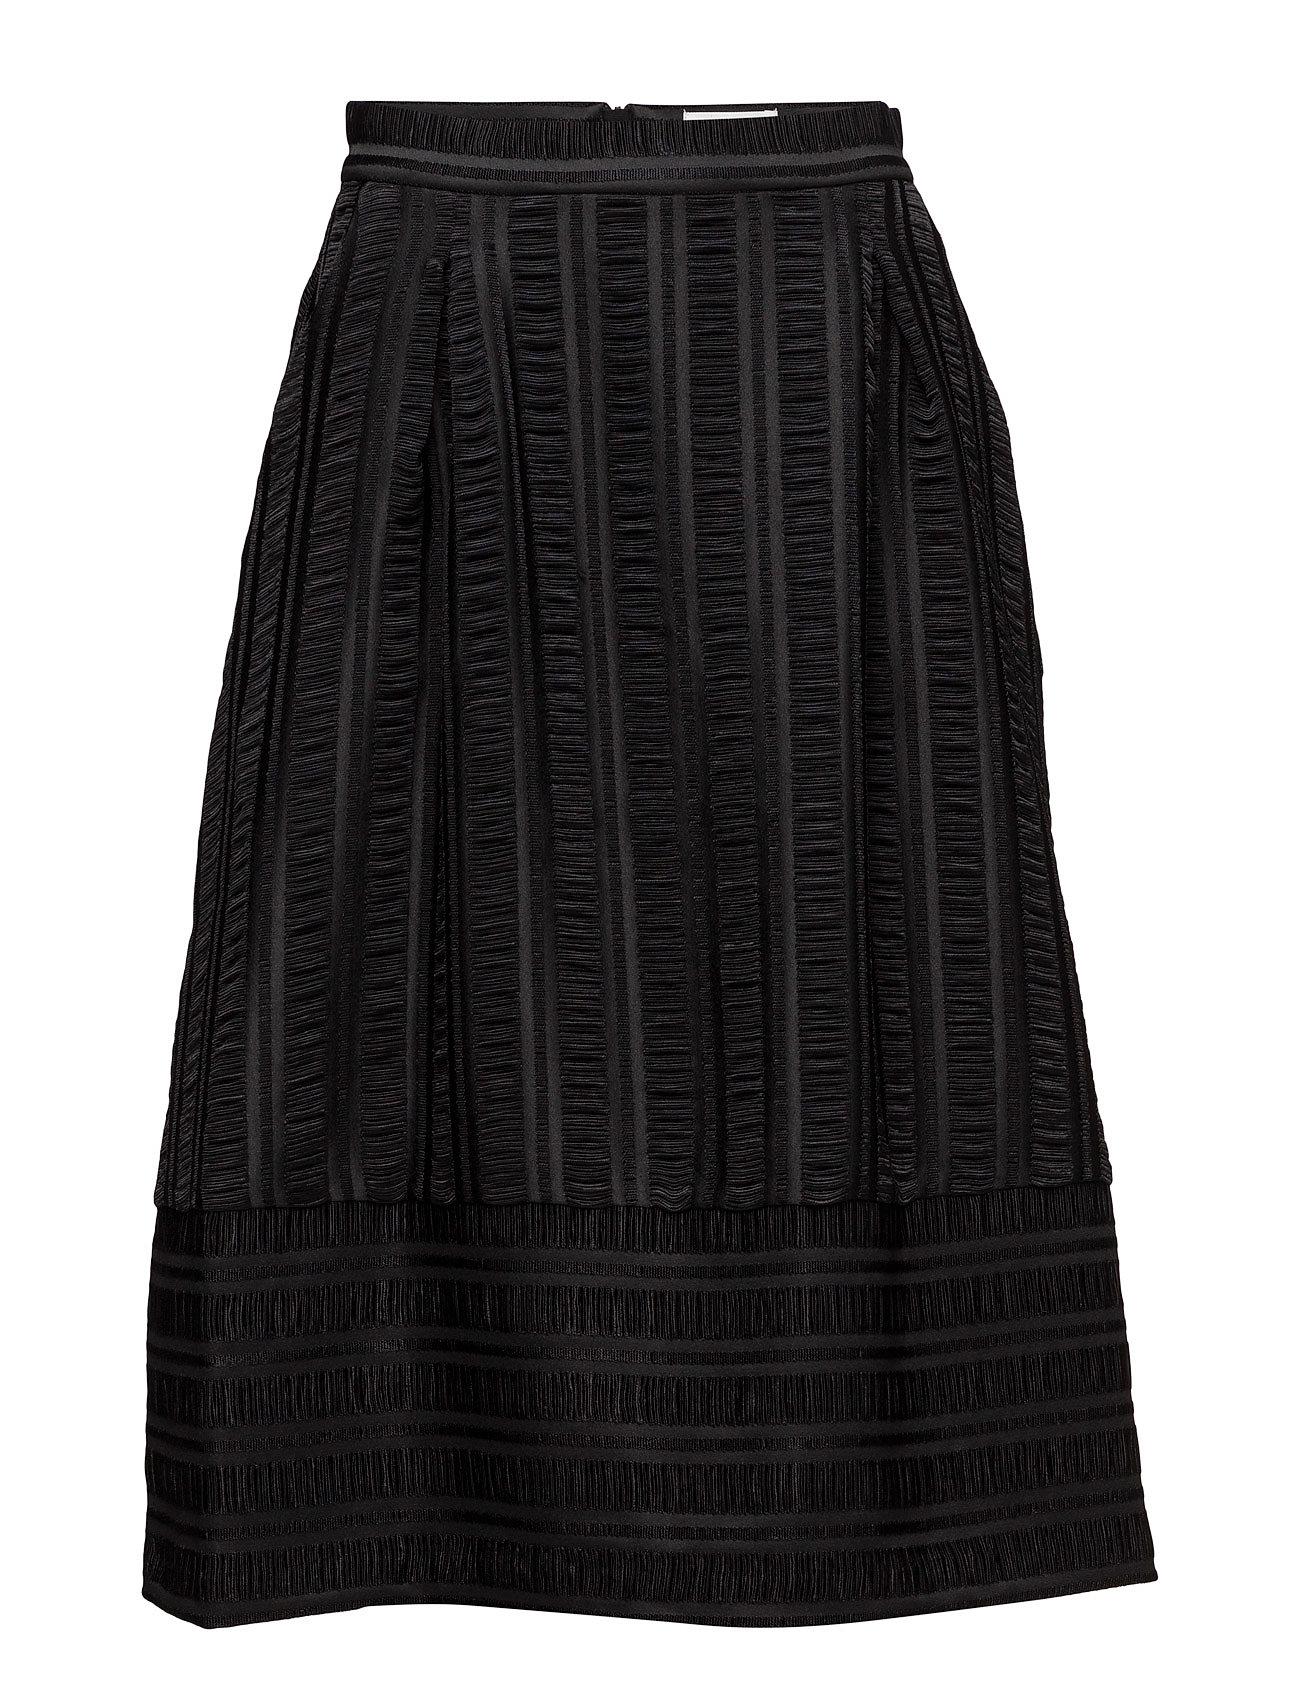 Jaqueline Skirt Hw